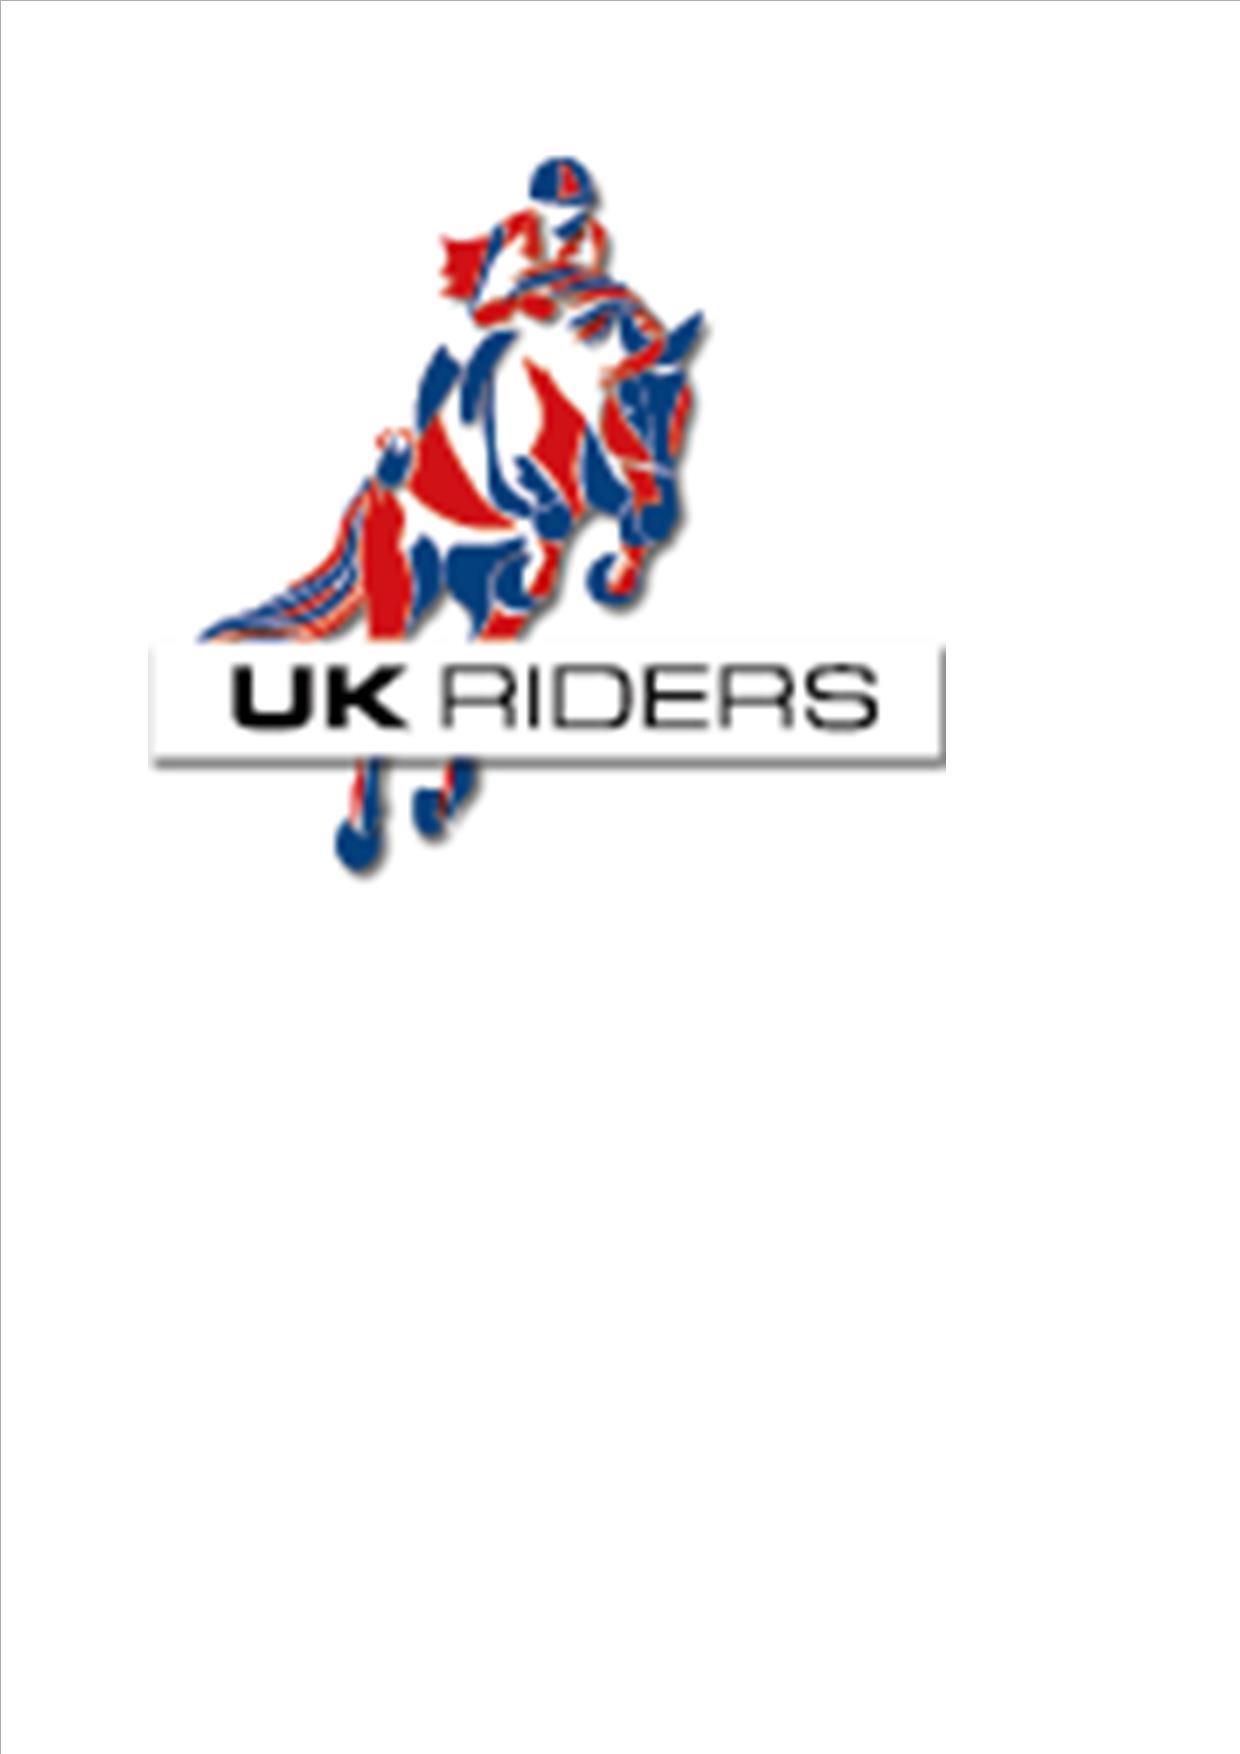 Chiltern & Thames Rider